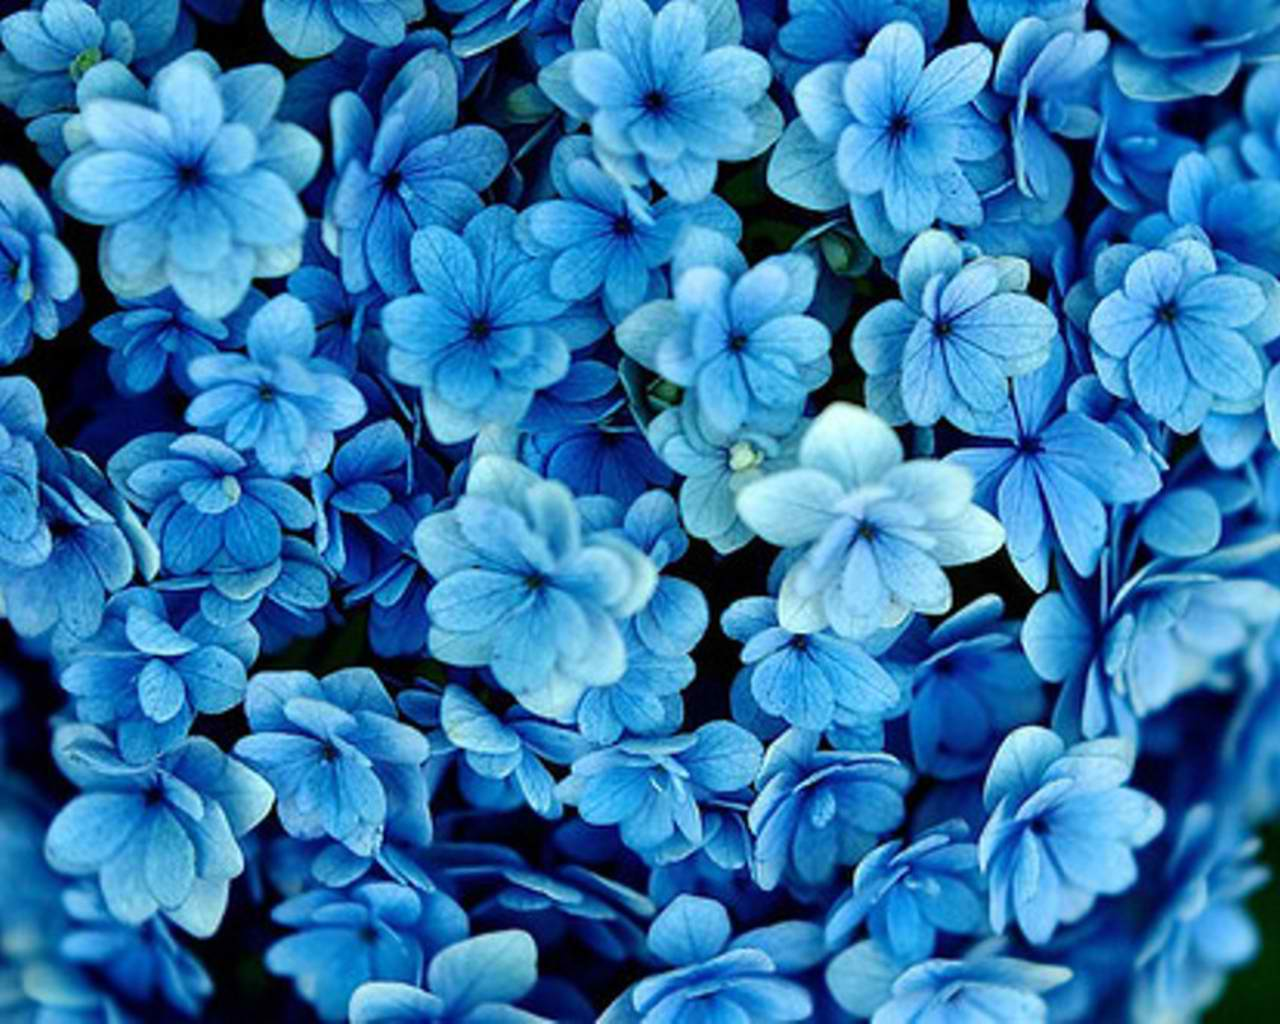 Wallpaper Background Blue Flowers